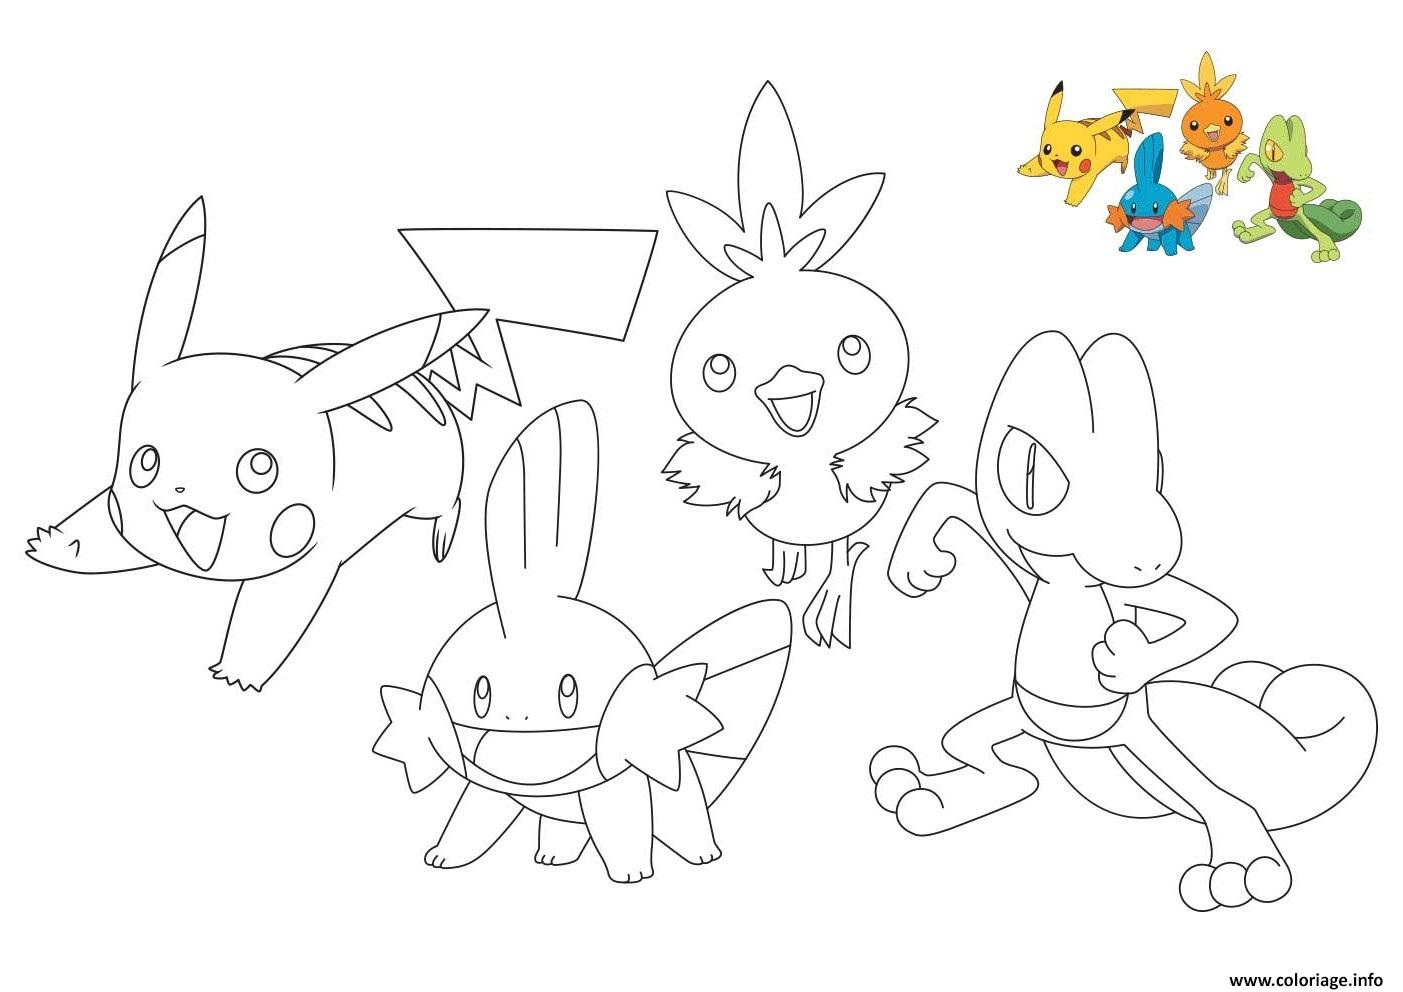 Dessin pokemon pikachu treecko torchic mudkip Coloriage Gratuit à Imprimer